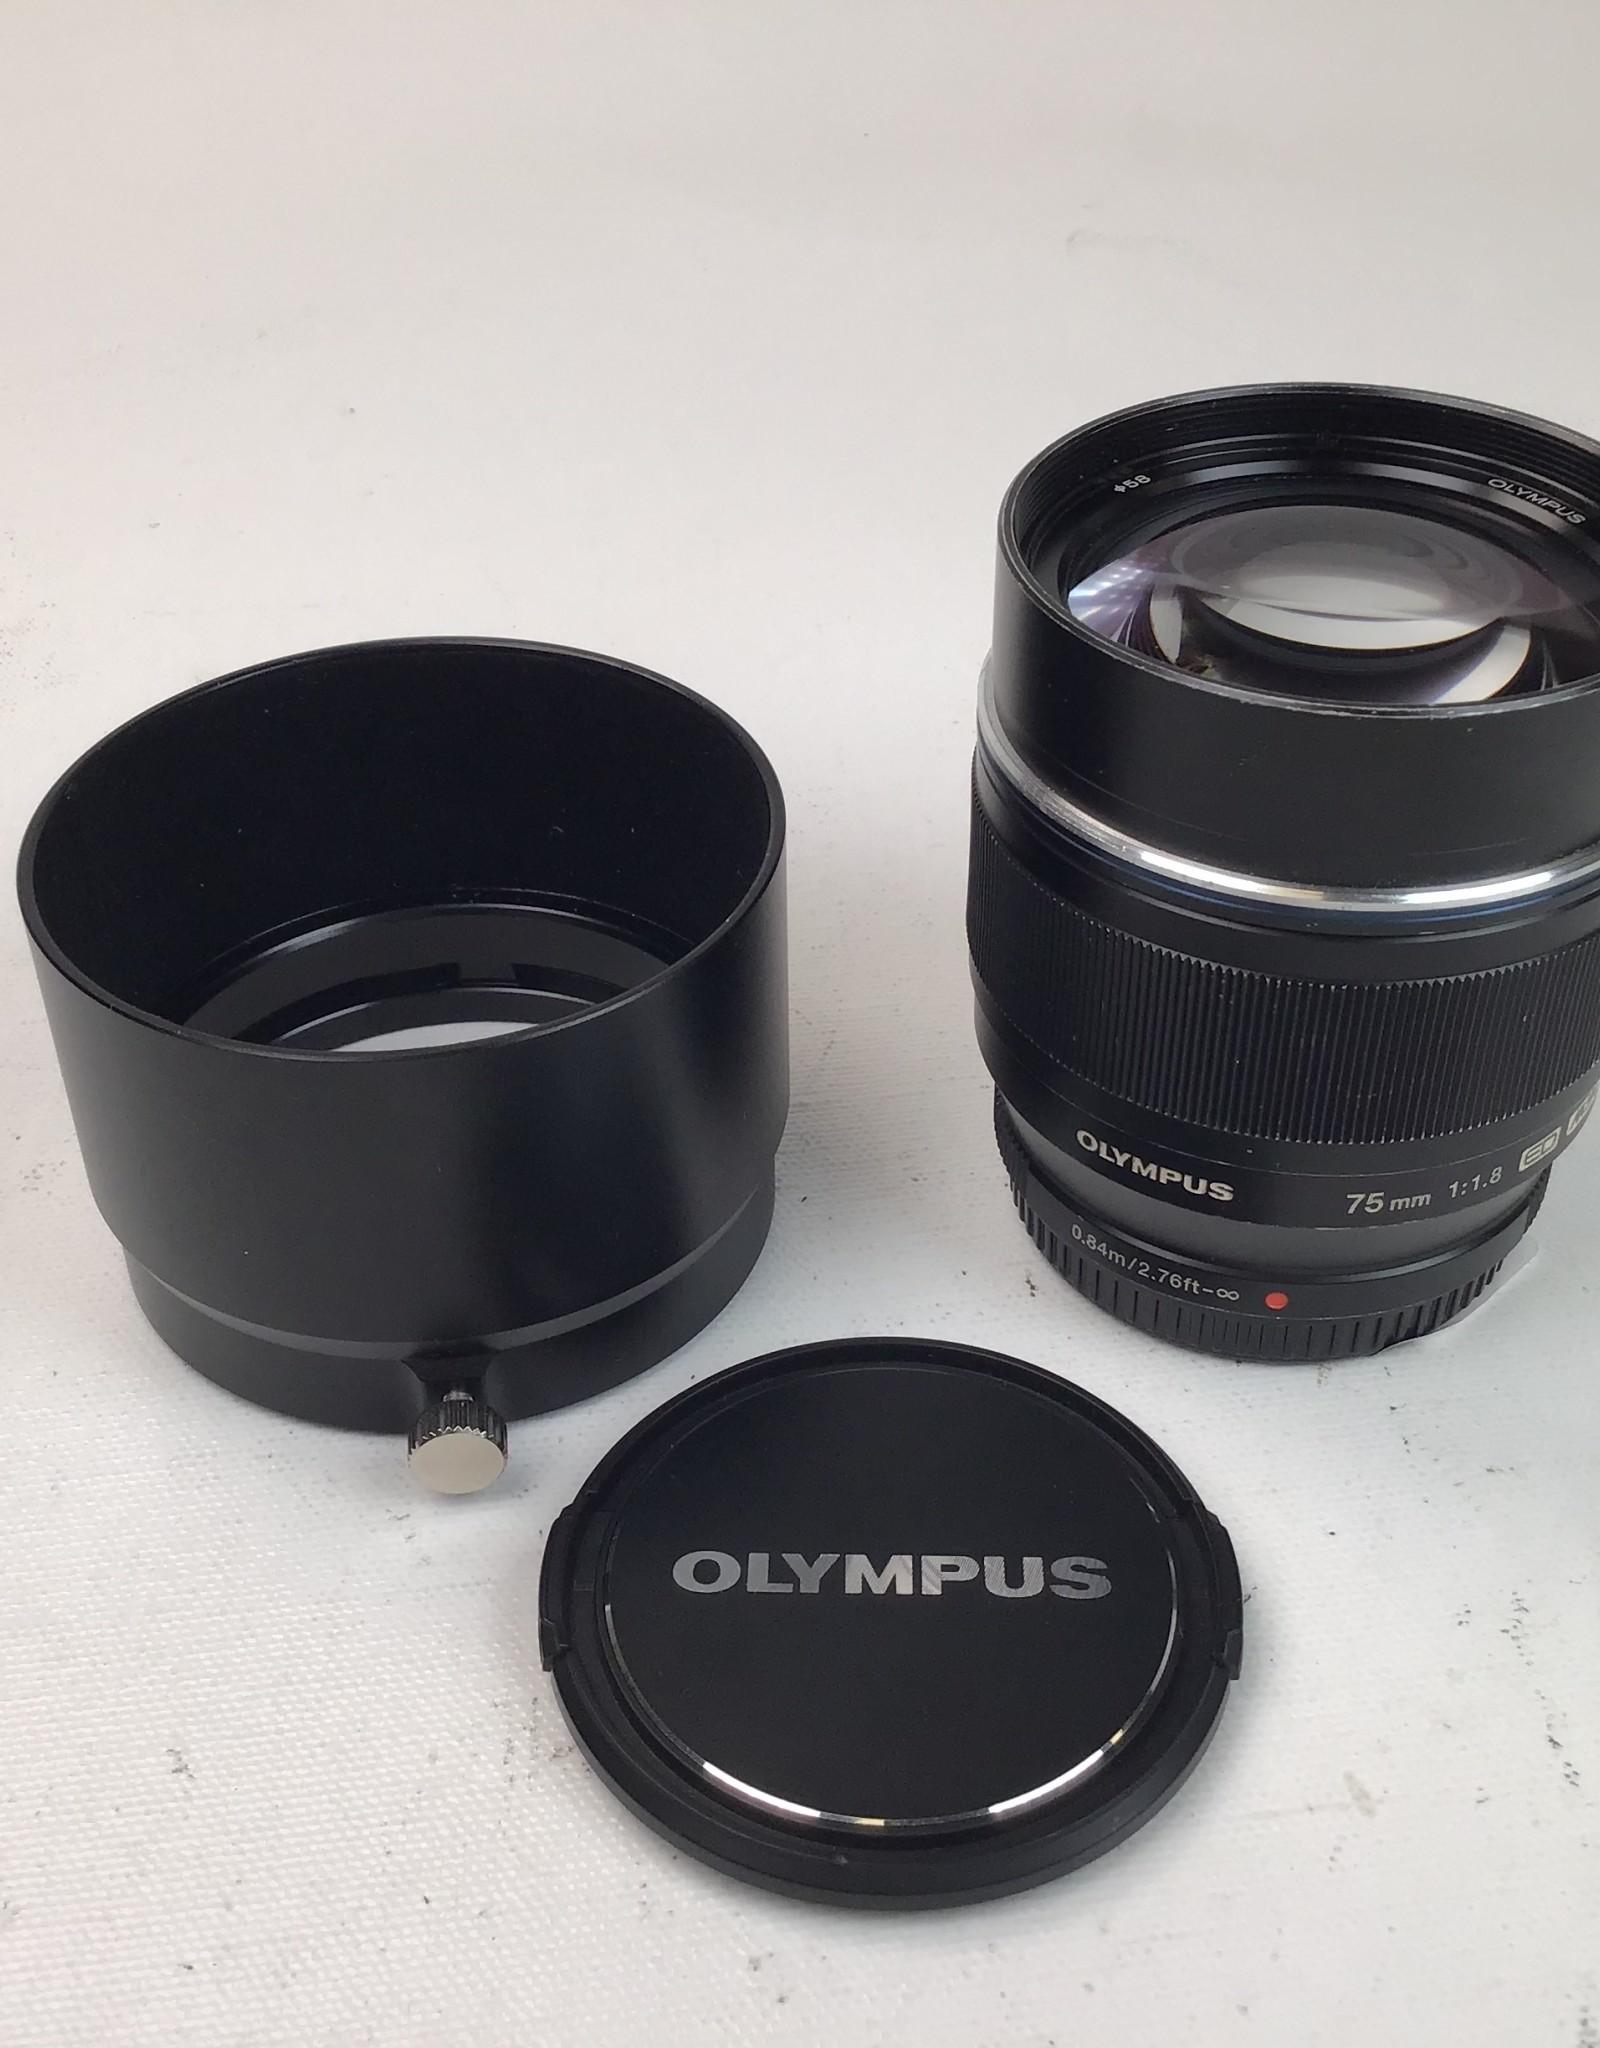 OLYMPUS Olympus 75mm f1.8 MFT Lens Used Fair